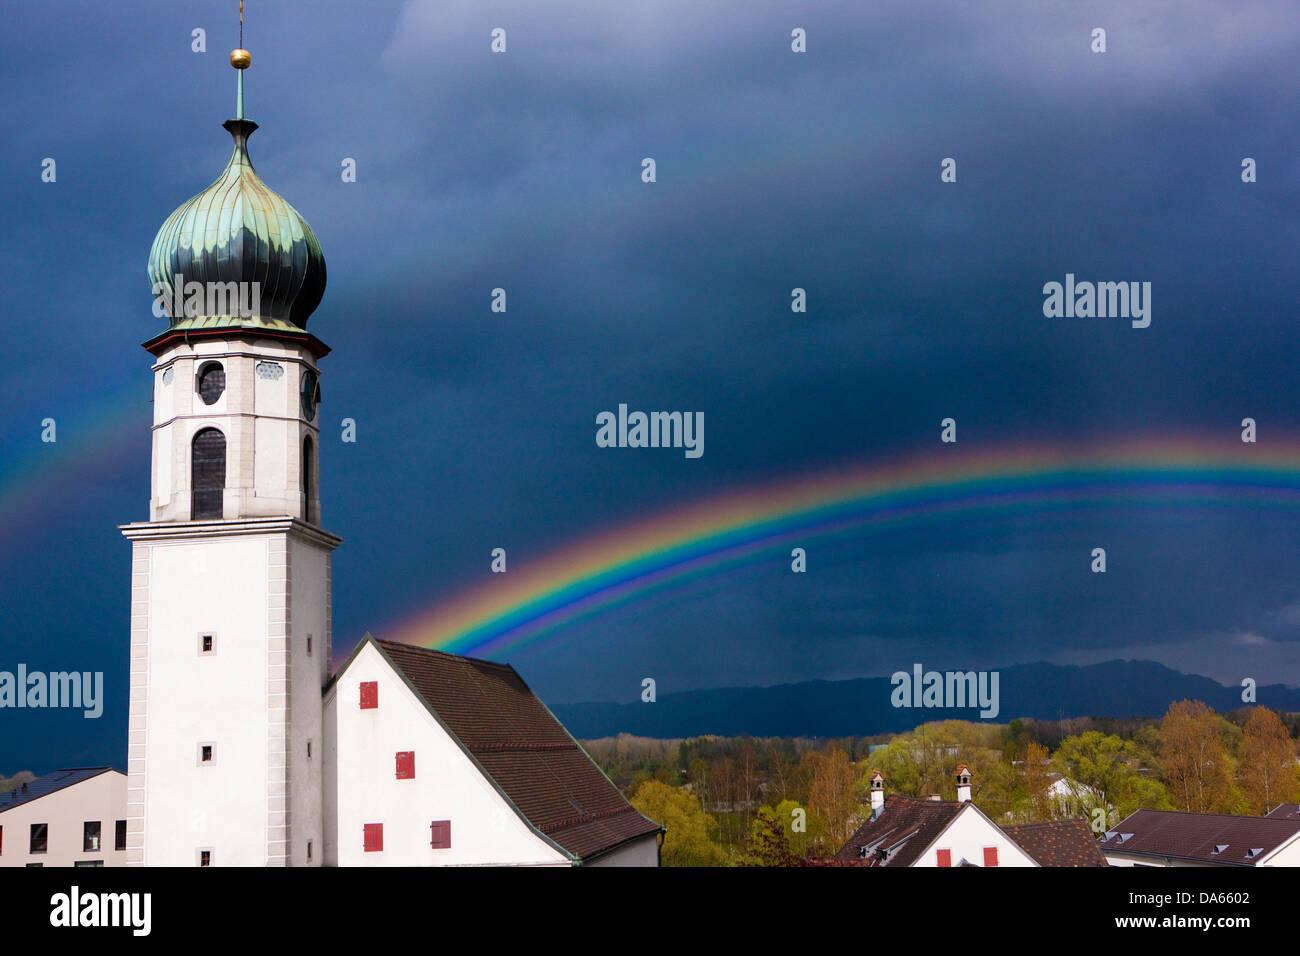 Protestant. reformed, church, Rheineck, rainbow, canton, SG, St. Gallen, weather, clouds, cloud, Switzerland, Europe, - Stock Image